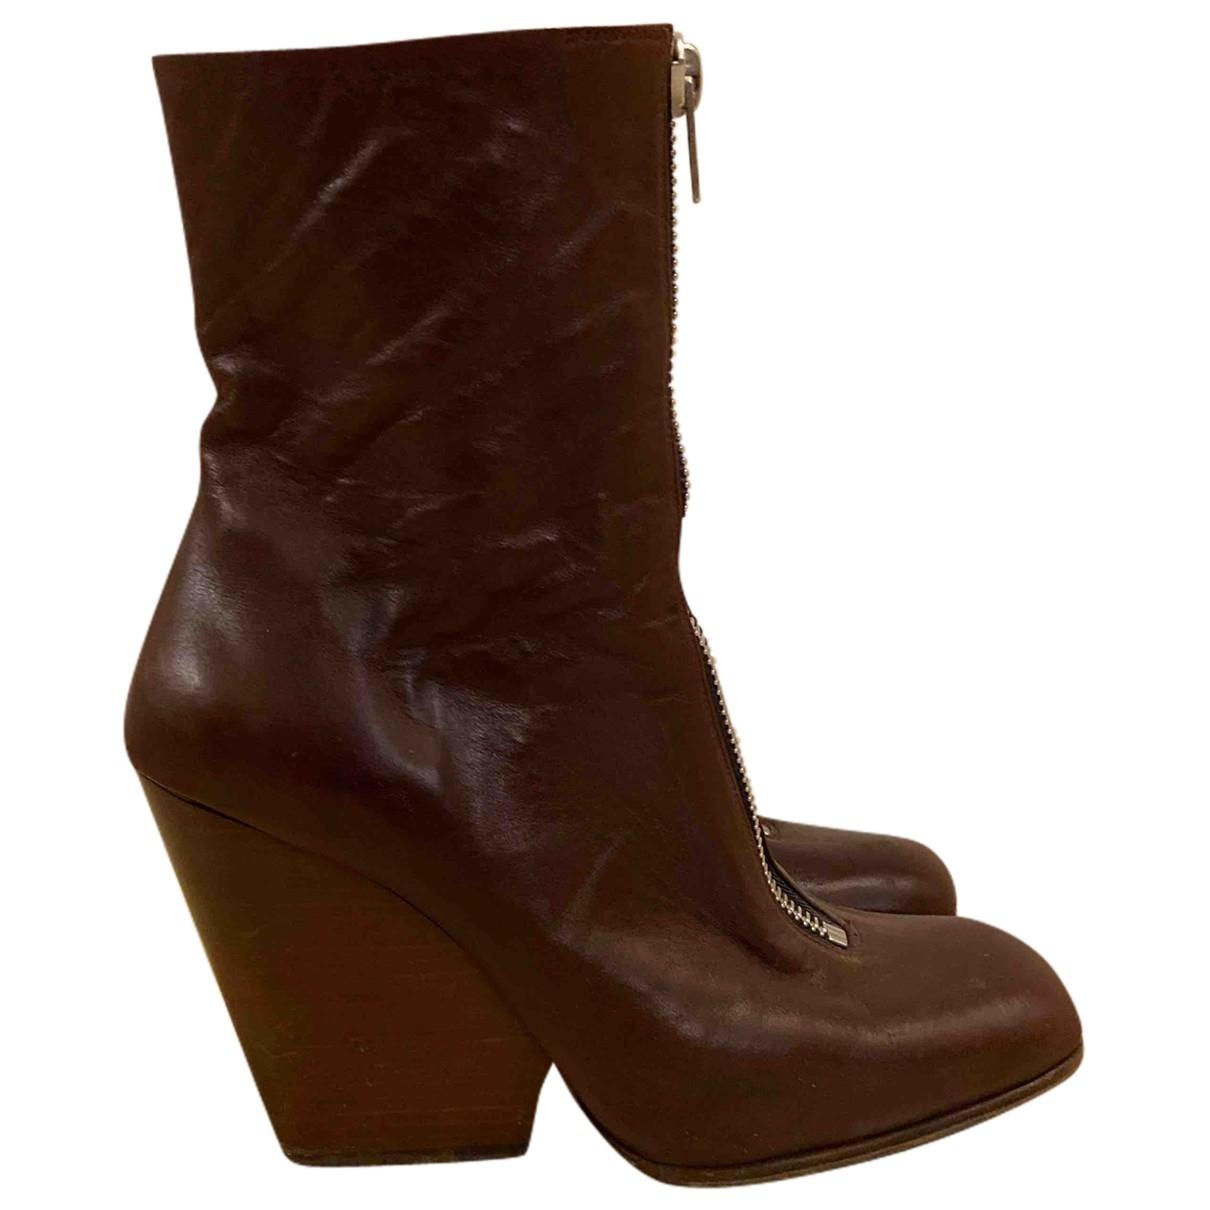 Celine \N Burgundy Leather Boots for Women 38.5 EU